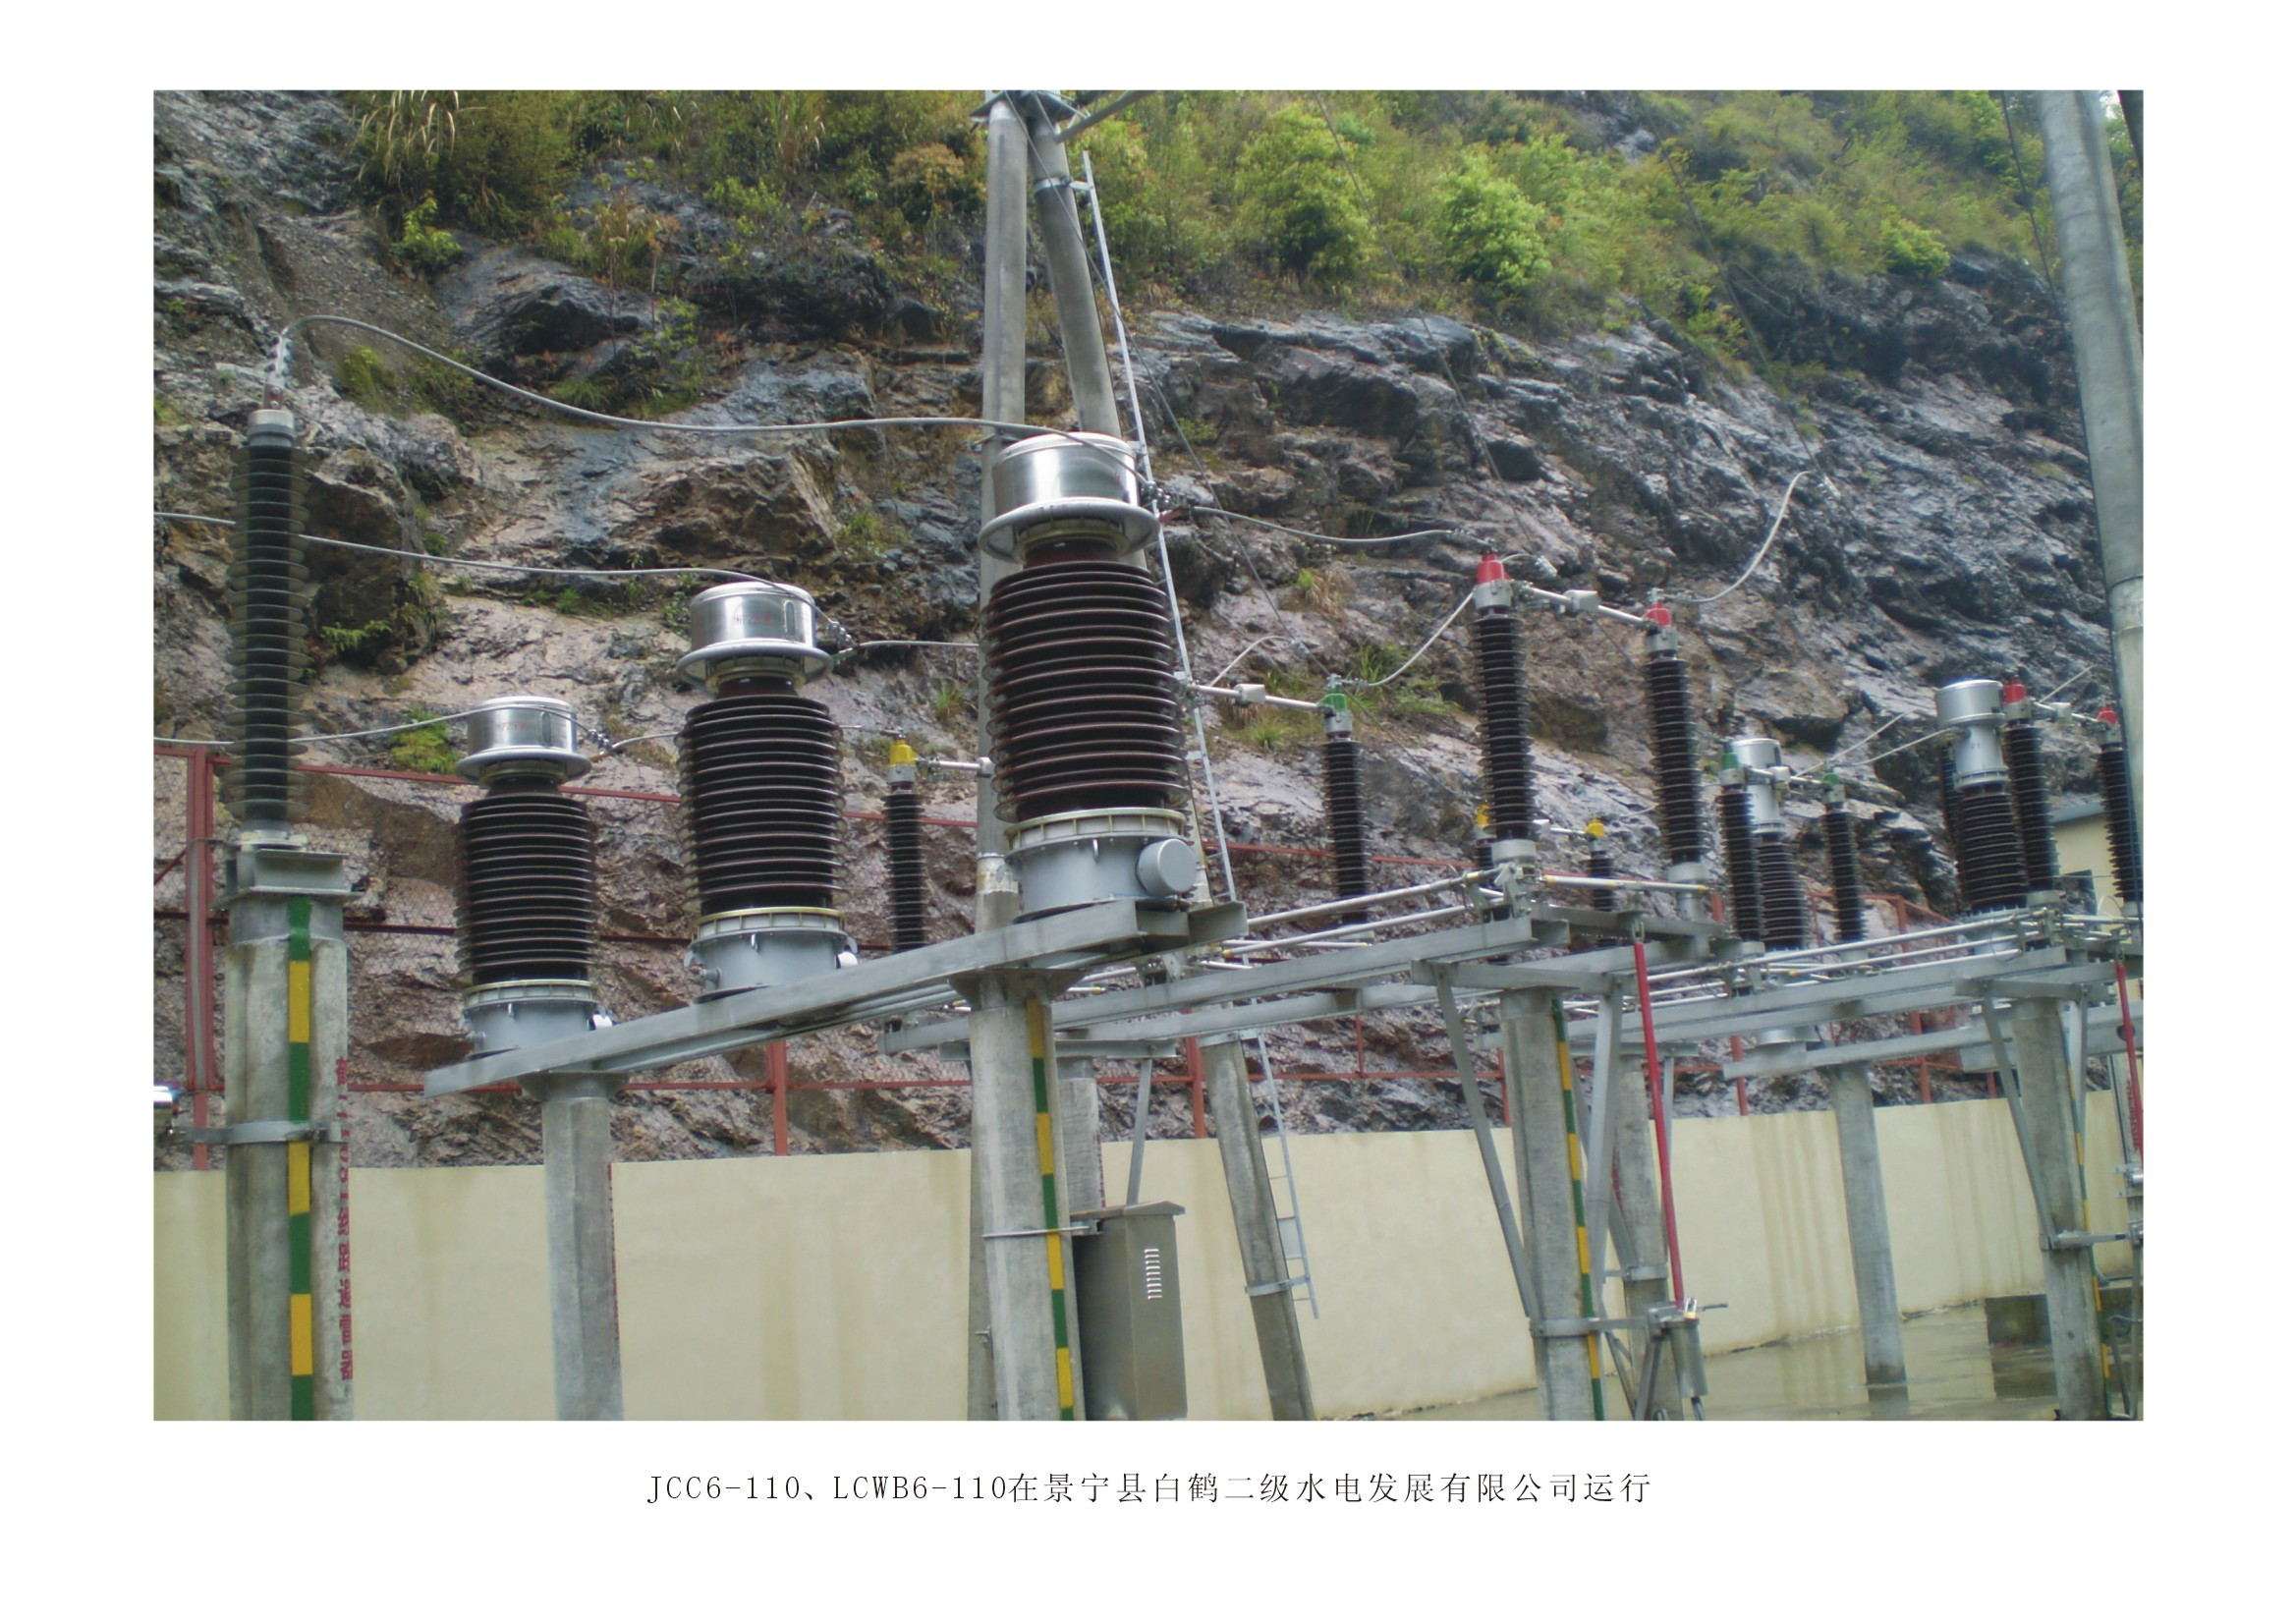 59JCC6-110、LCWB6-110在景寧縣白鶴二級水電發展有限公司運行